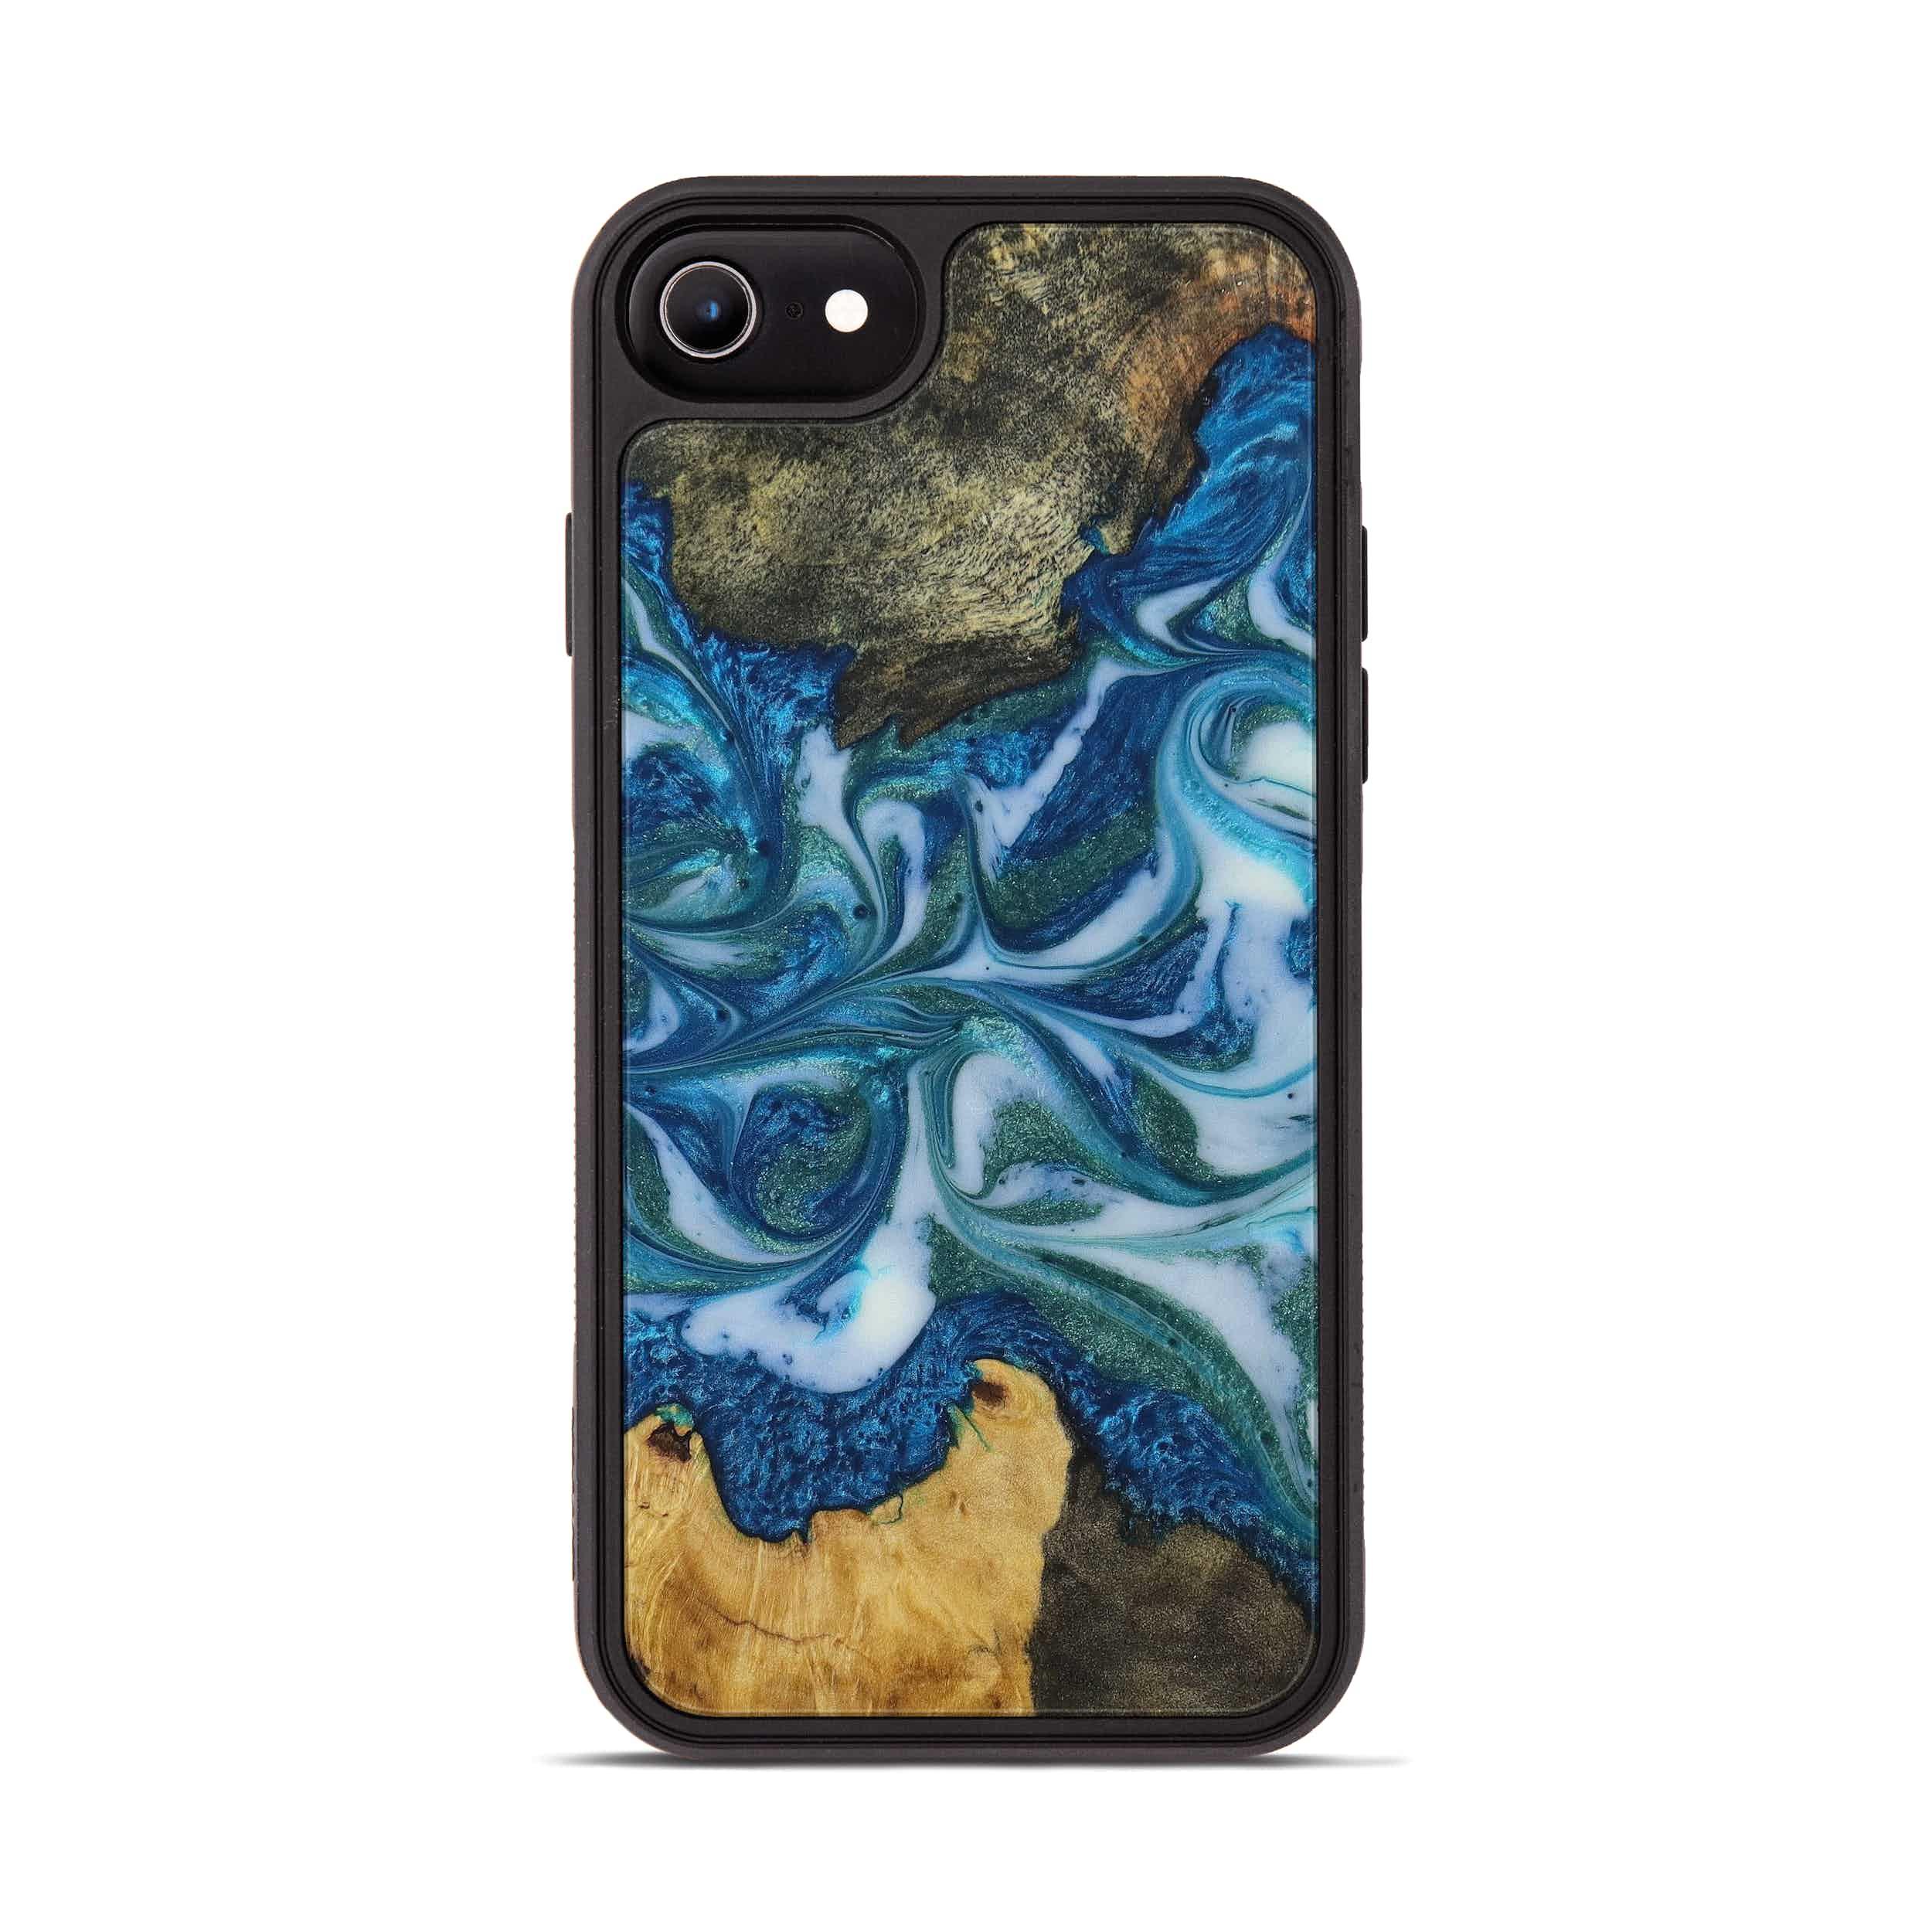 iPhone 8 Wood+Resin Phone Case - Shedman (Light Blue, 394834)